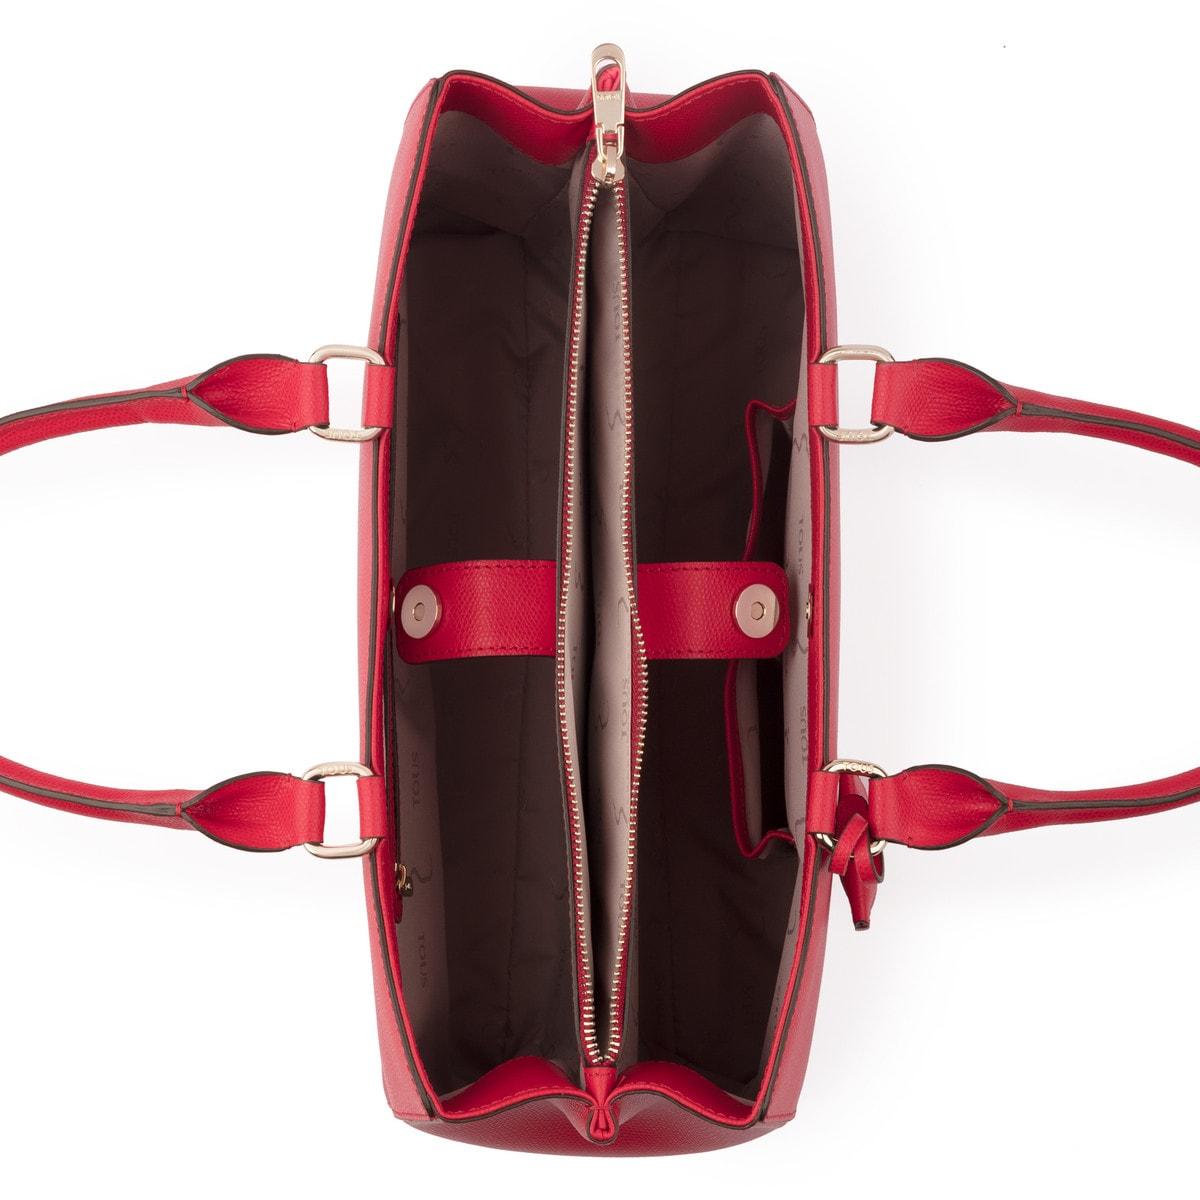 ab1c2d4b31 Τσάντα πόλης μεσαίου μεγέθους Odalis από Δέρμα σε κόκκινο χρώμα ...